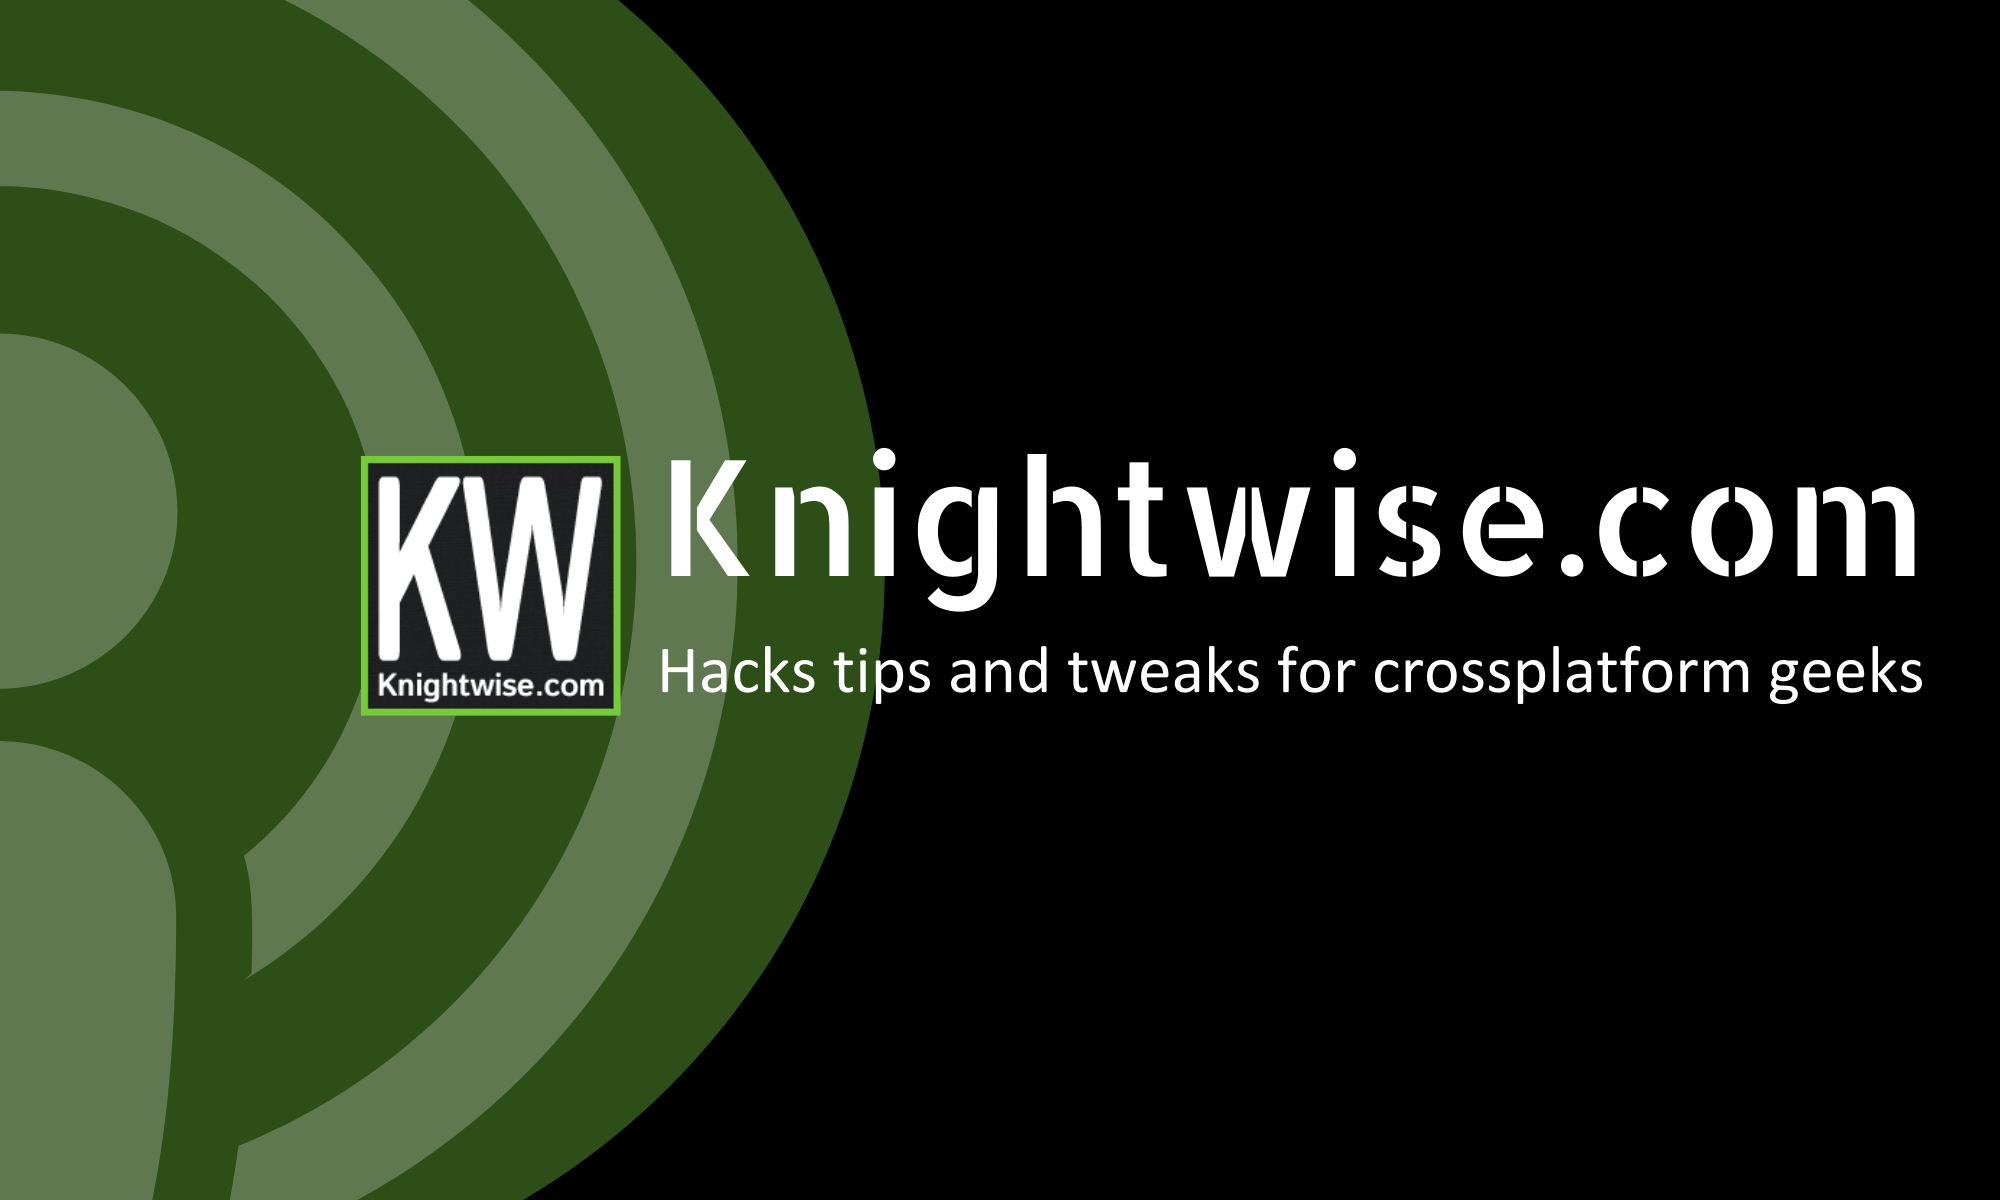 Knightwise.com